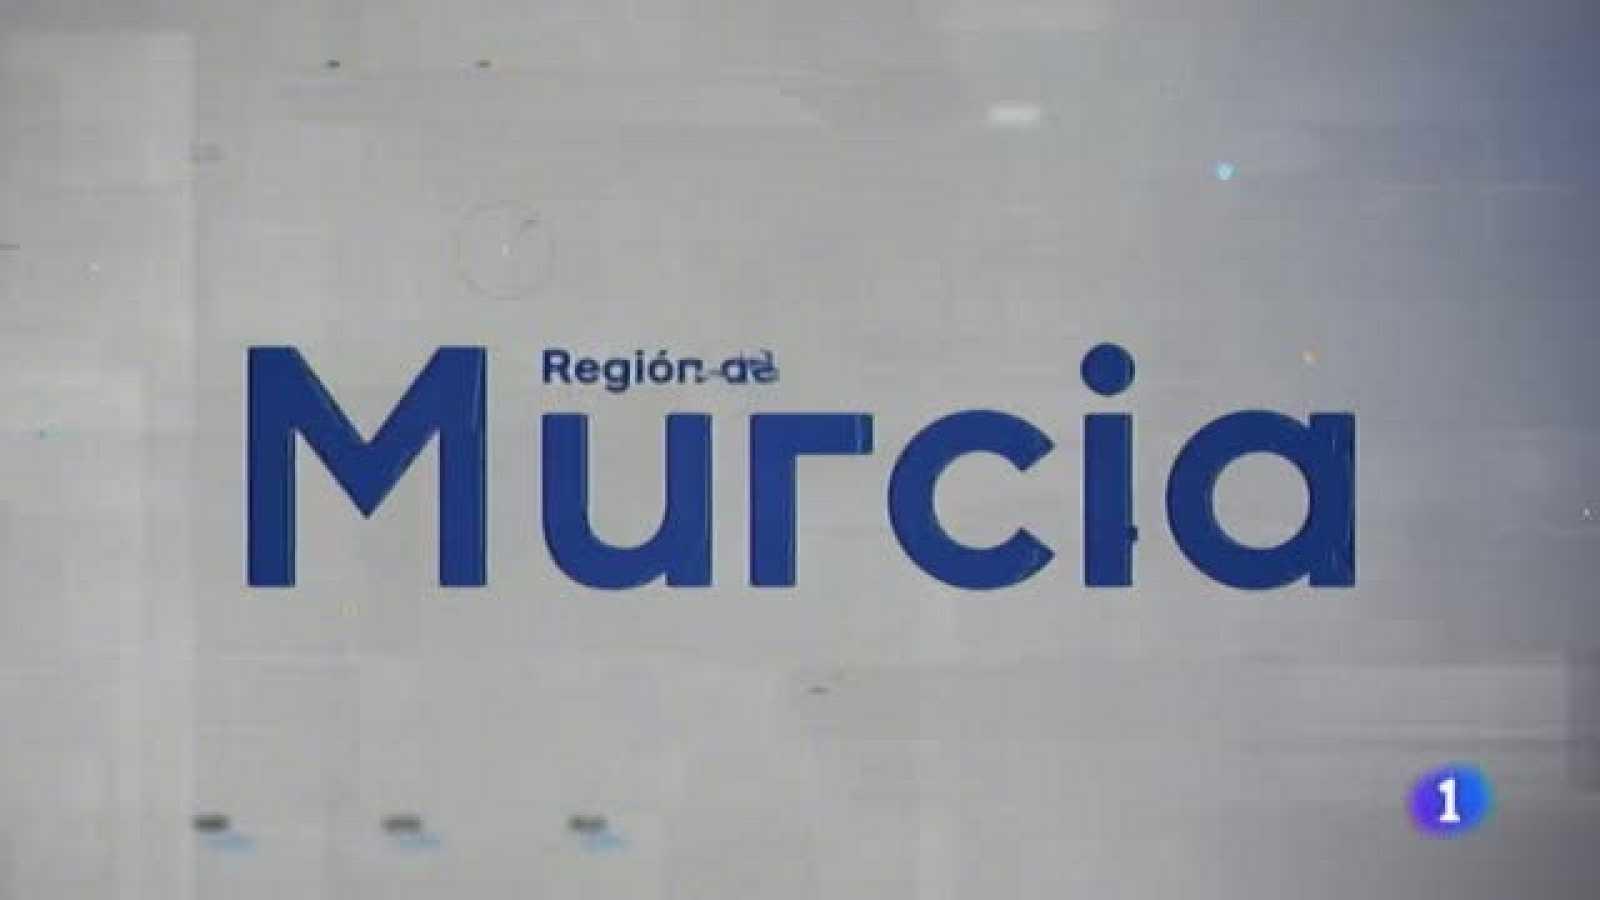 Noticias Murcia 2 - 26/04/2021